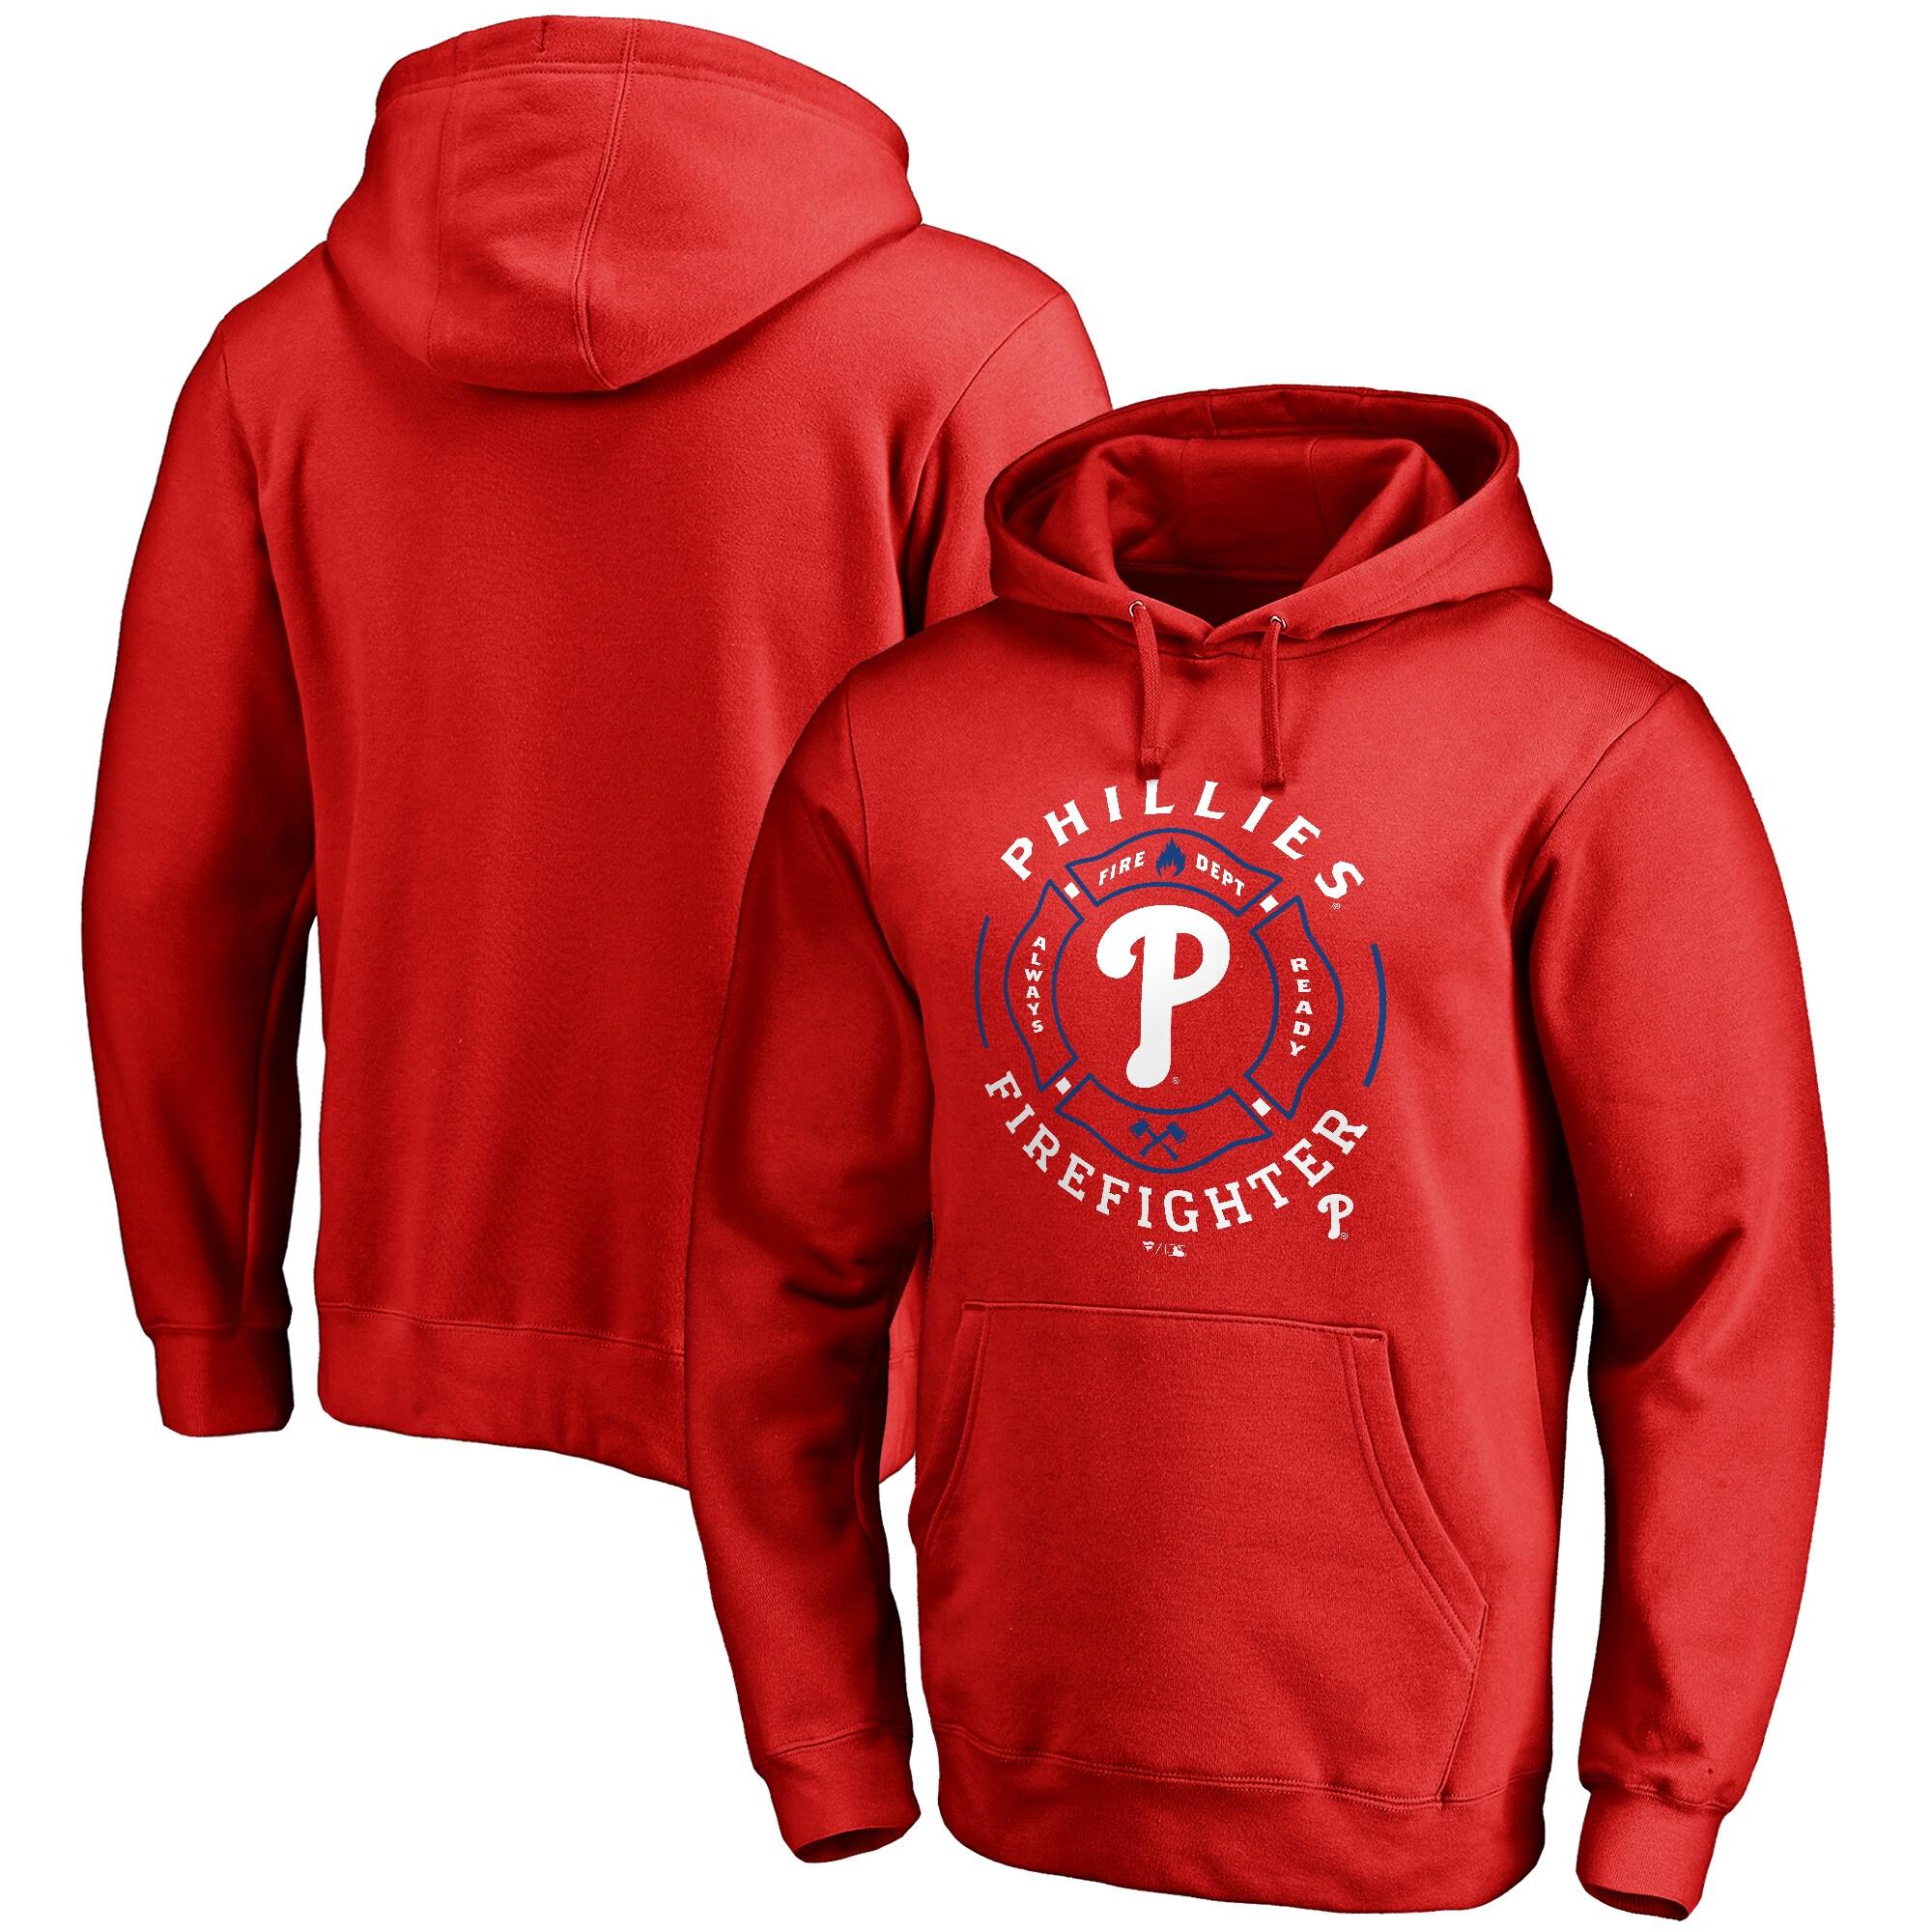 Philadelphia Phillies Firefighter Pullover Hoodie - Red